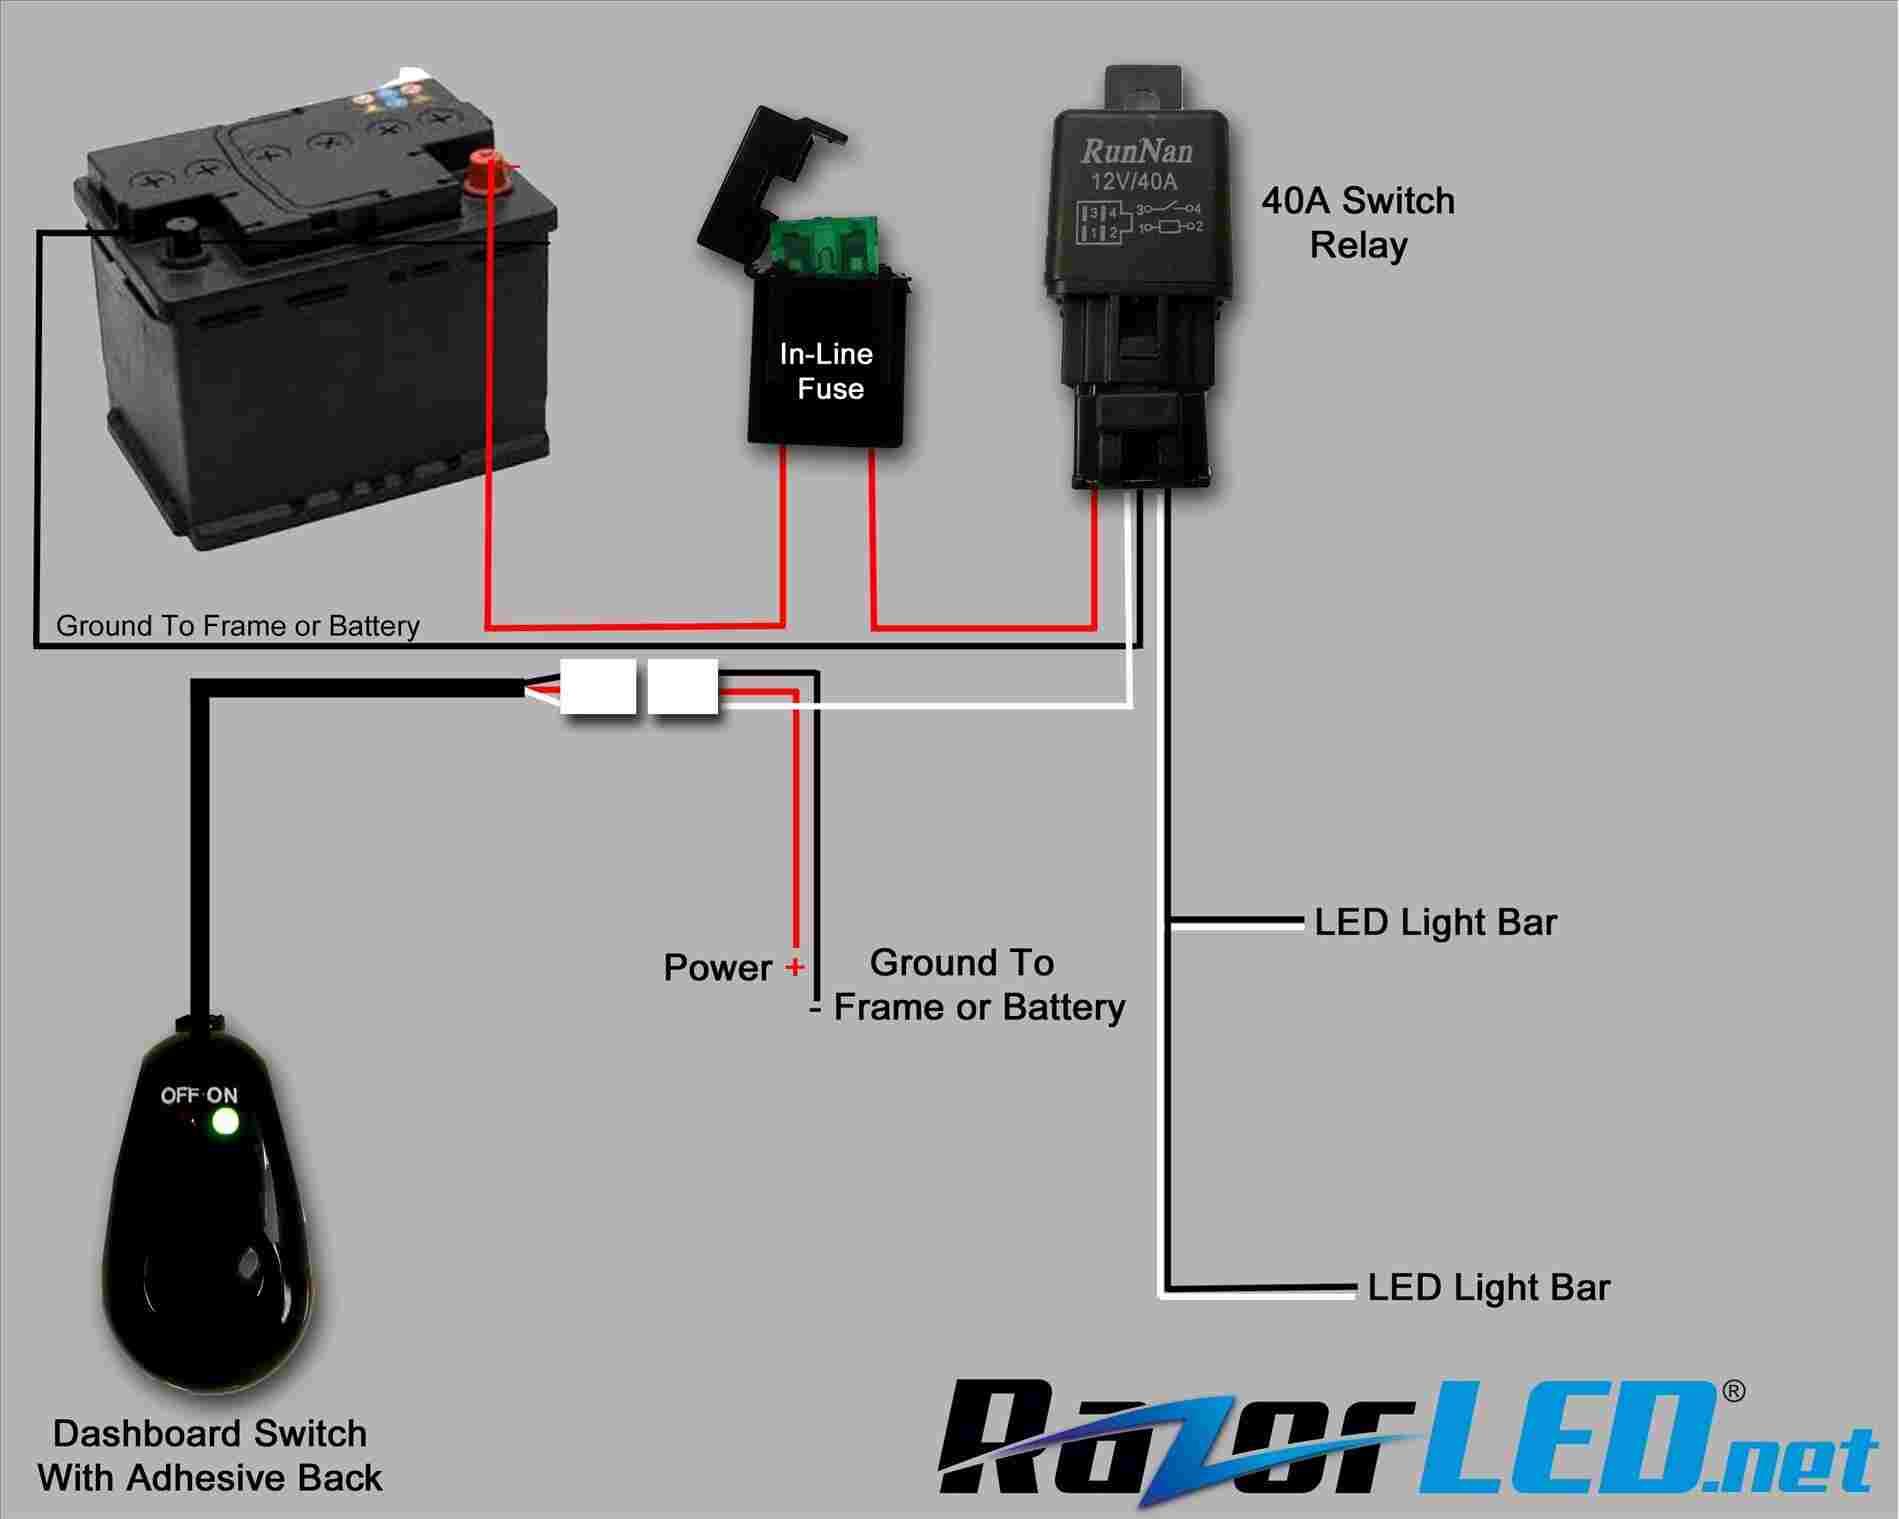 Wiring-Diagram-Webtor-Bunch-Ideas-Of-Simple-Led-Rhbritishpantoorg - Autofeel Light Bar Wiring Diagram